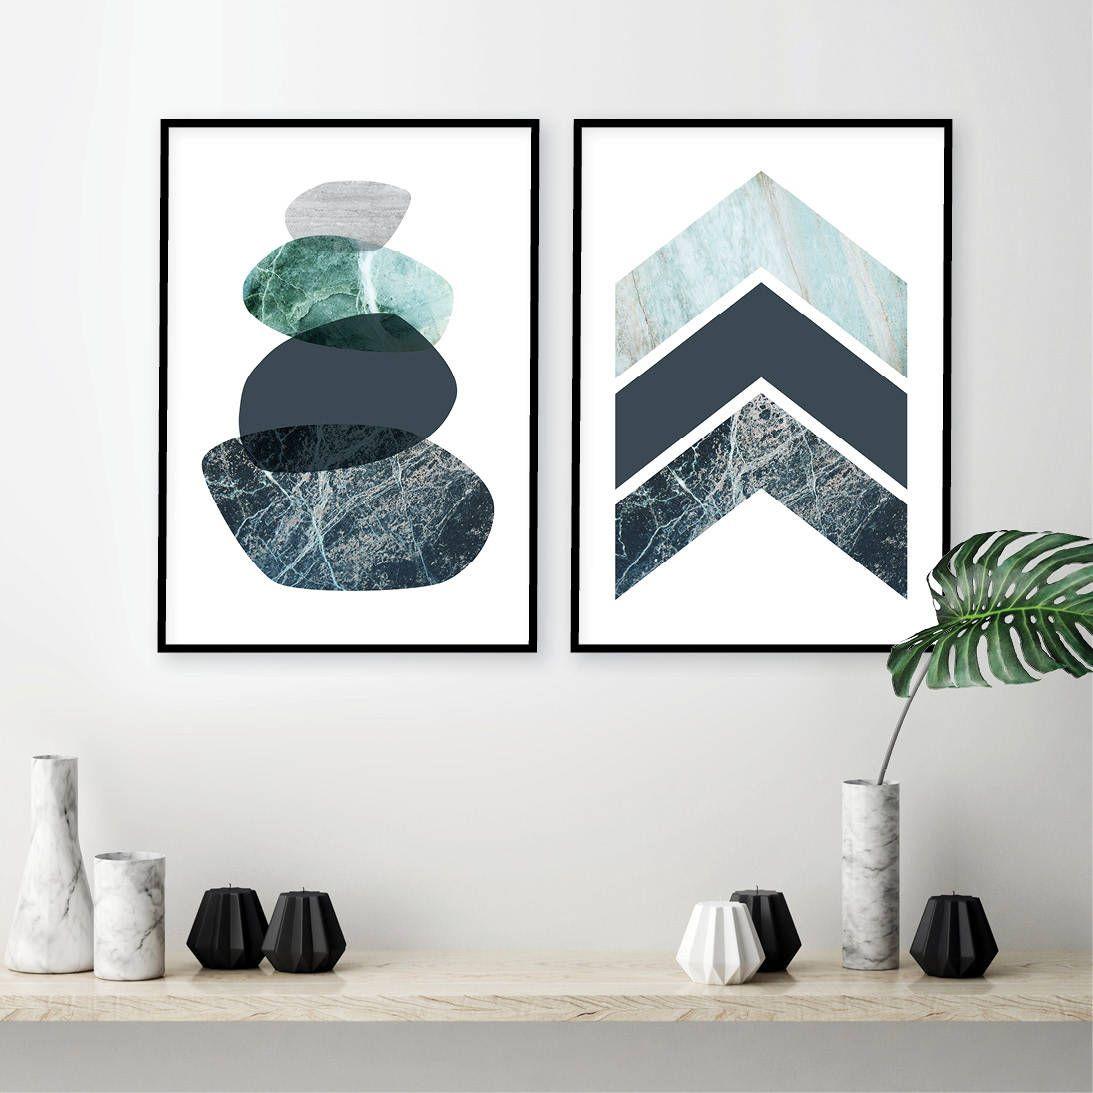 Set Of 2 Printable Posters Of Balancing Stones Chevrons Scandinavian Downloadable Prints Minimalist Scandi Wall Art Modern Bedroom Wall Art Posters Printable Bedroom Wall Art Minimalist Wall Art